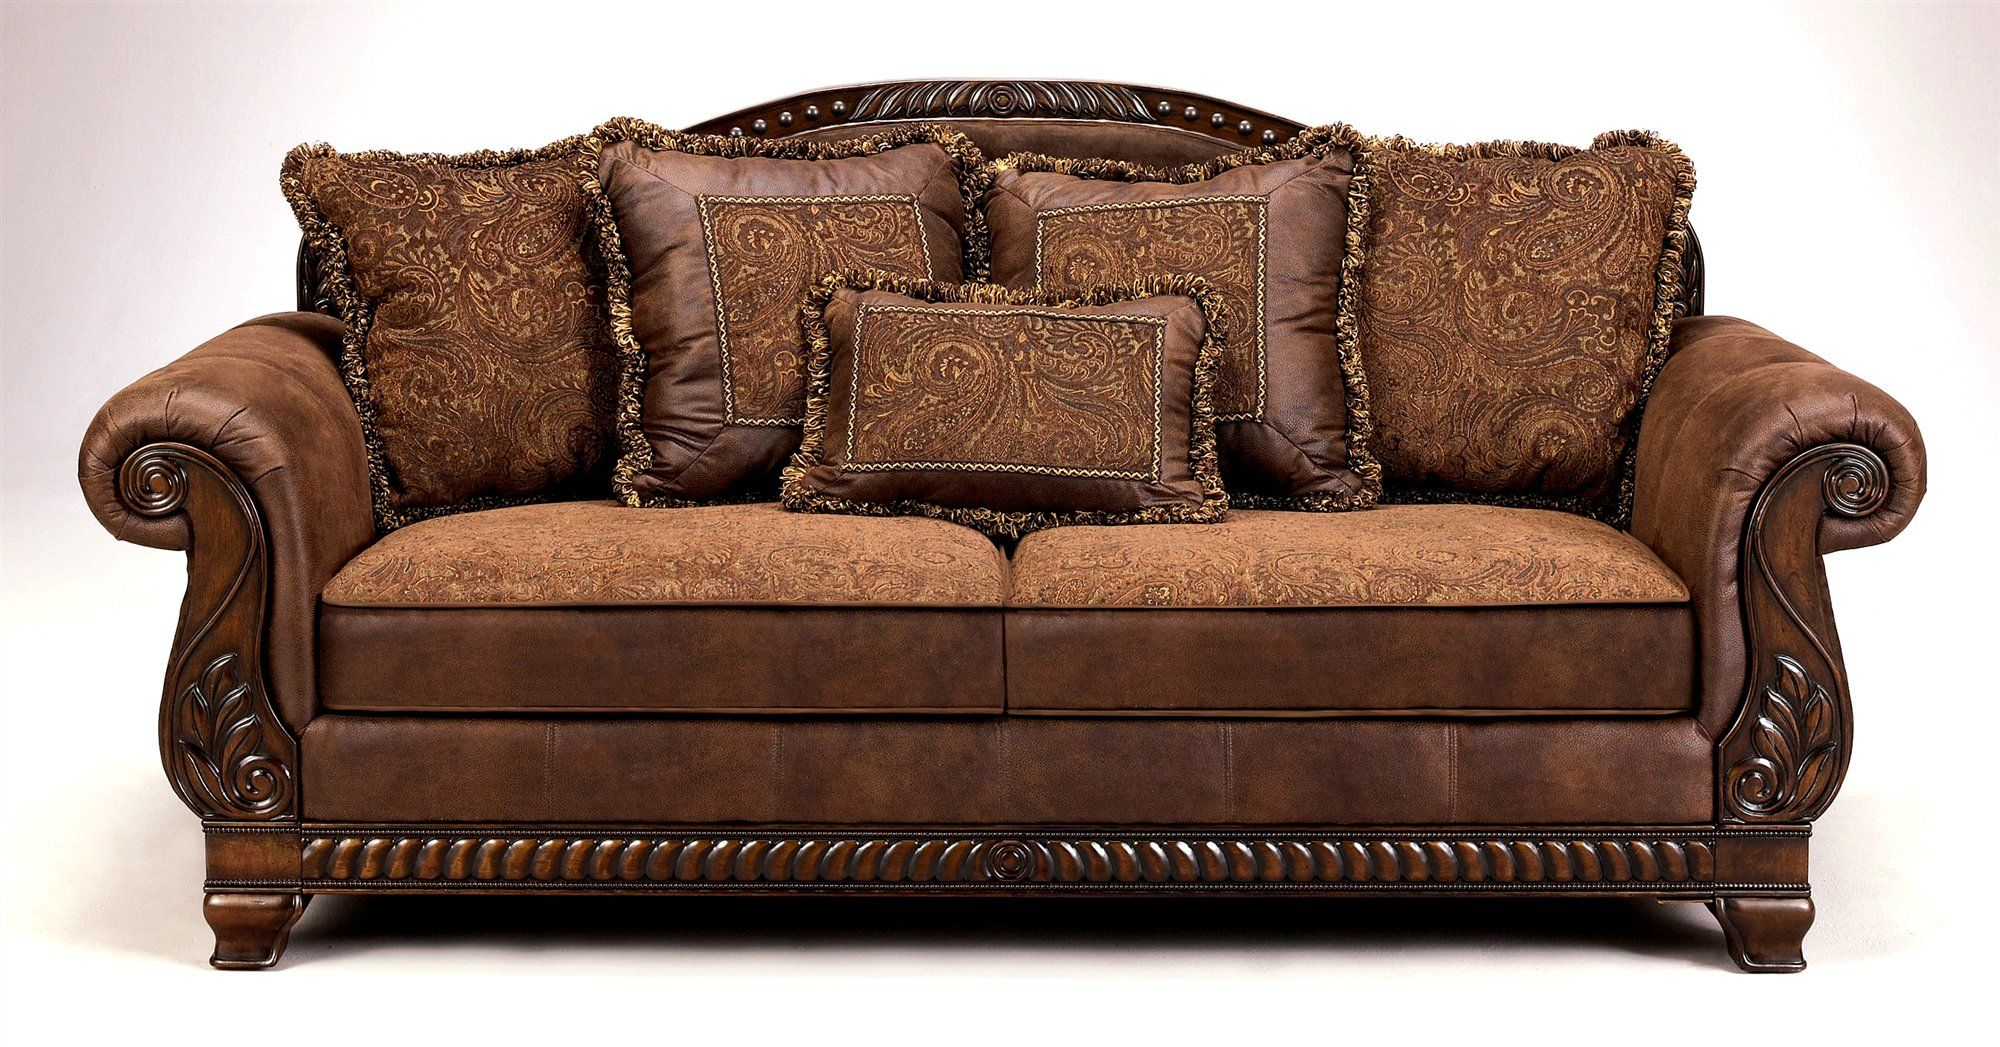 Store Low Furniture Price Me Near